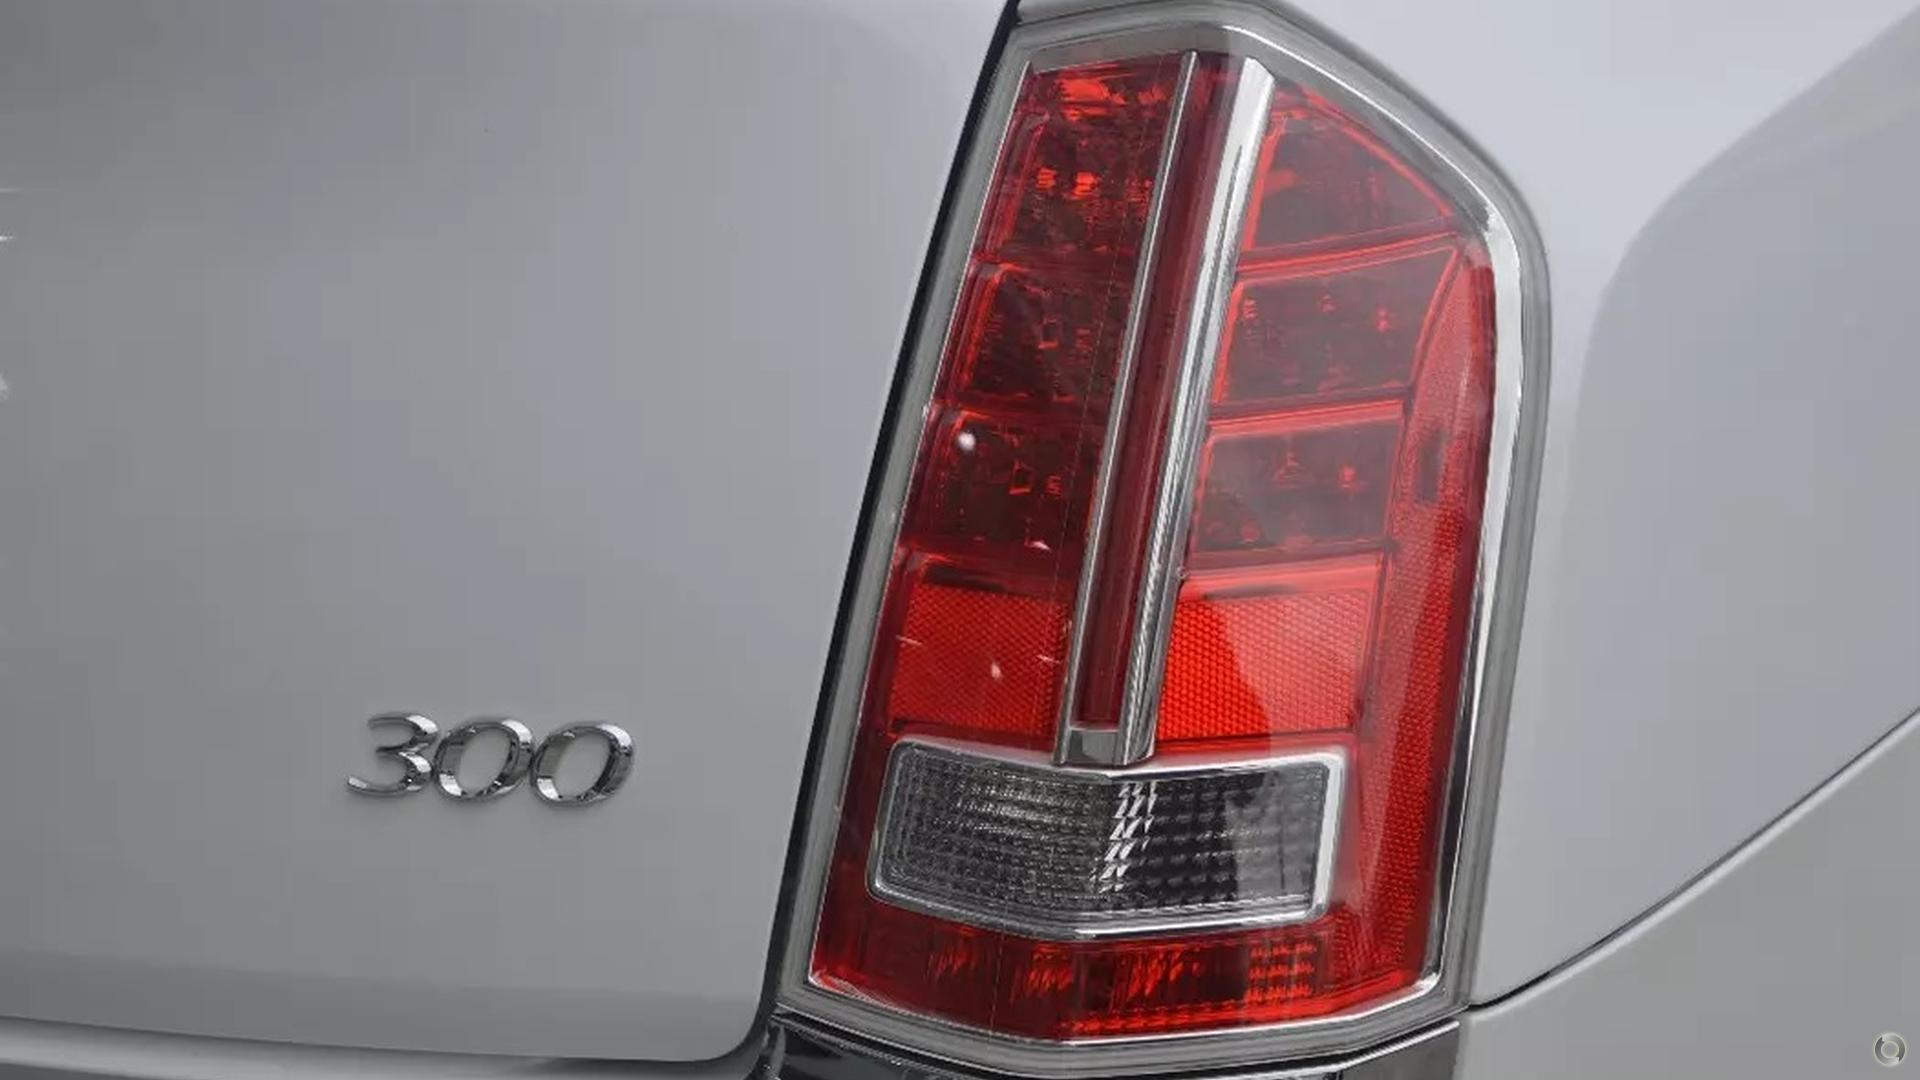 2012 Chrysler 300 Limited LX